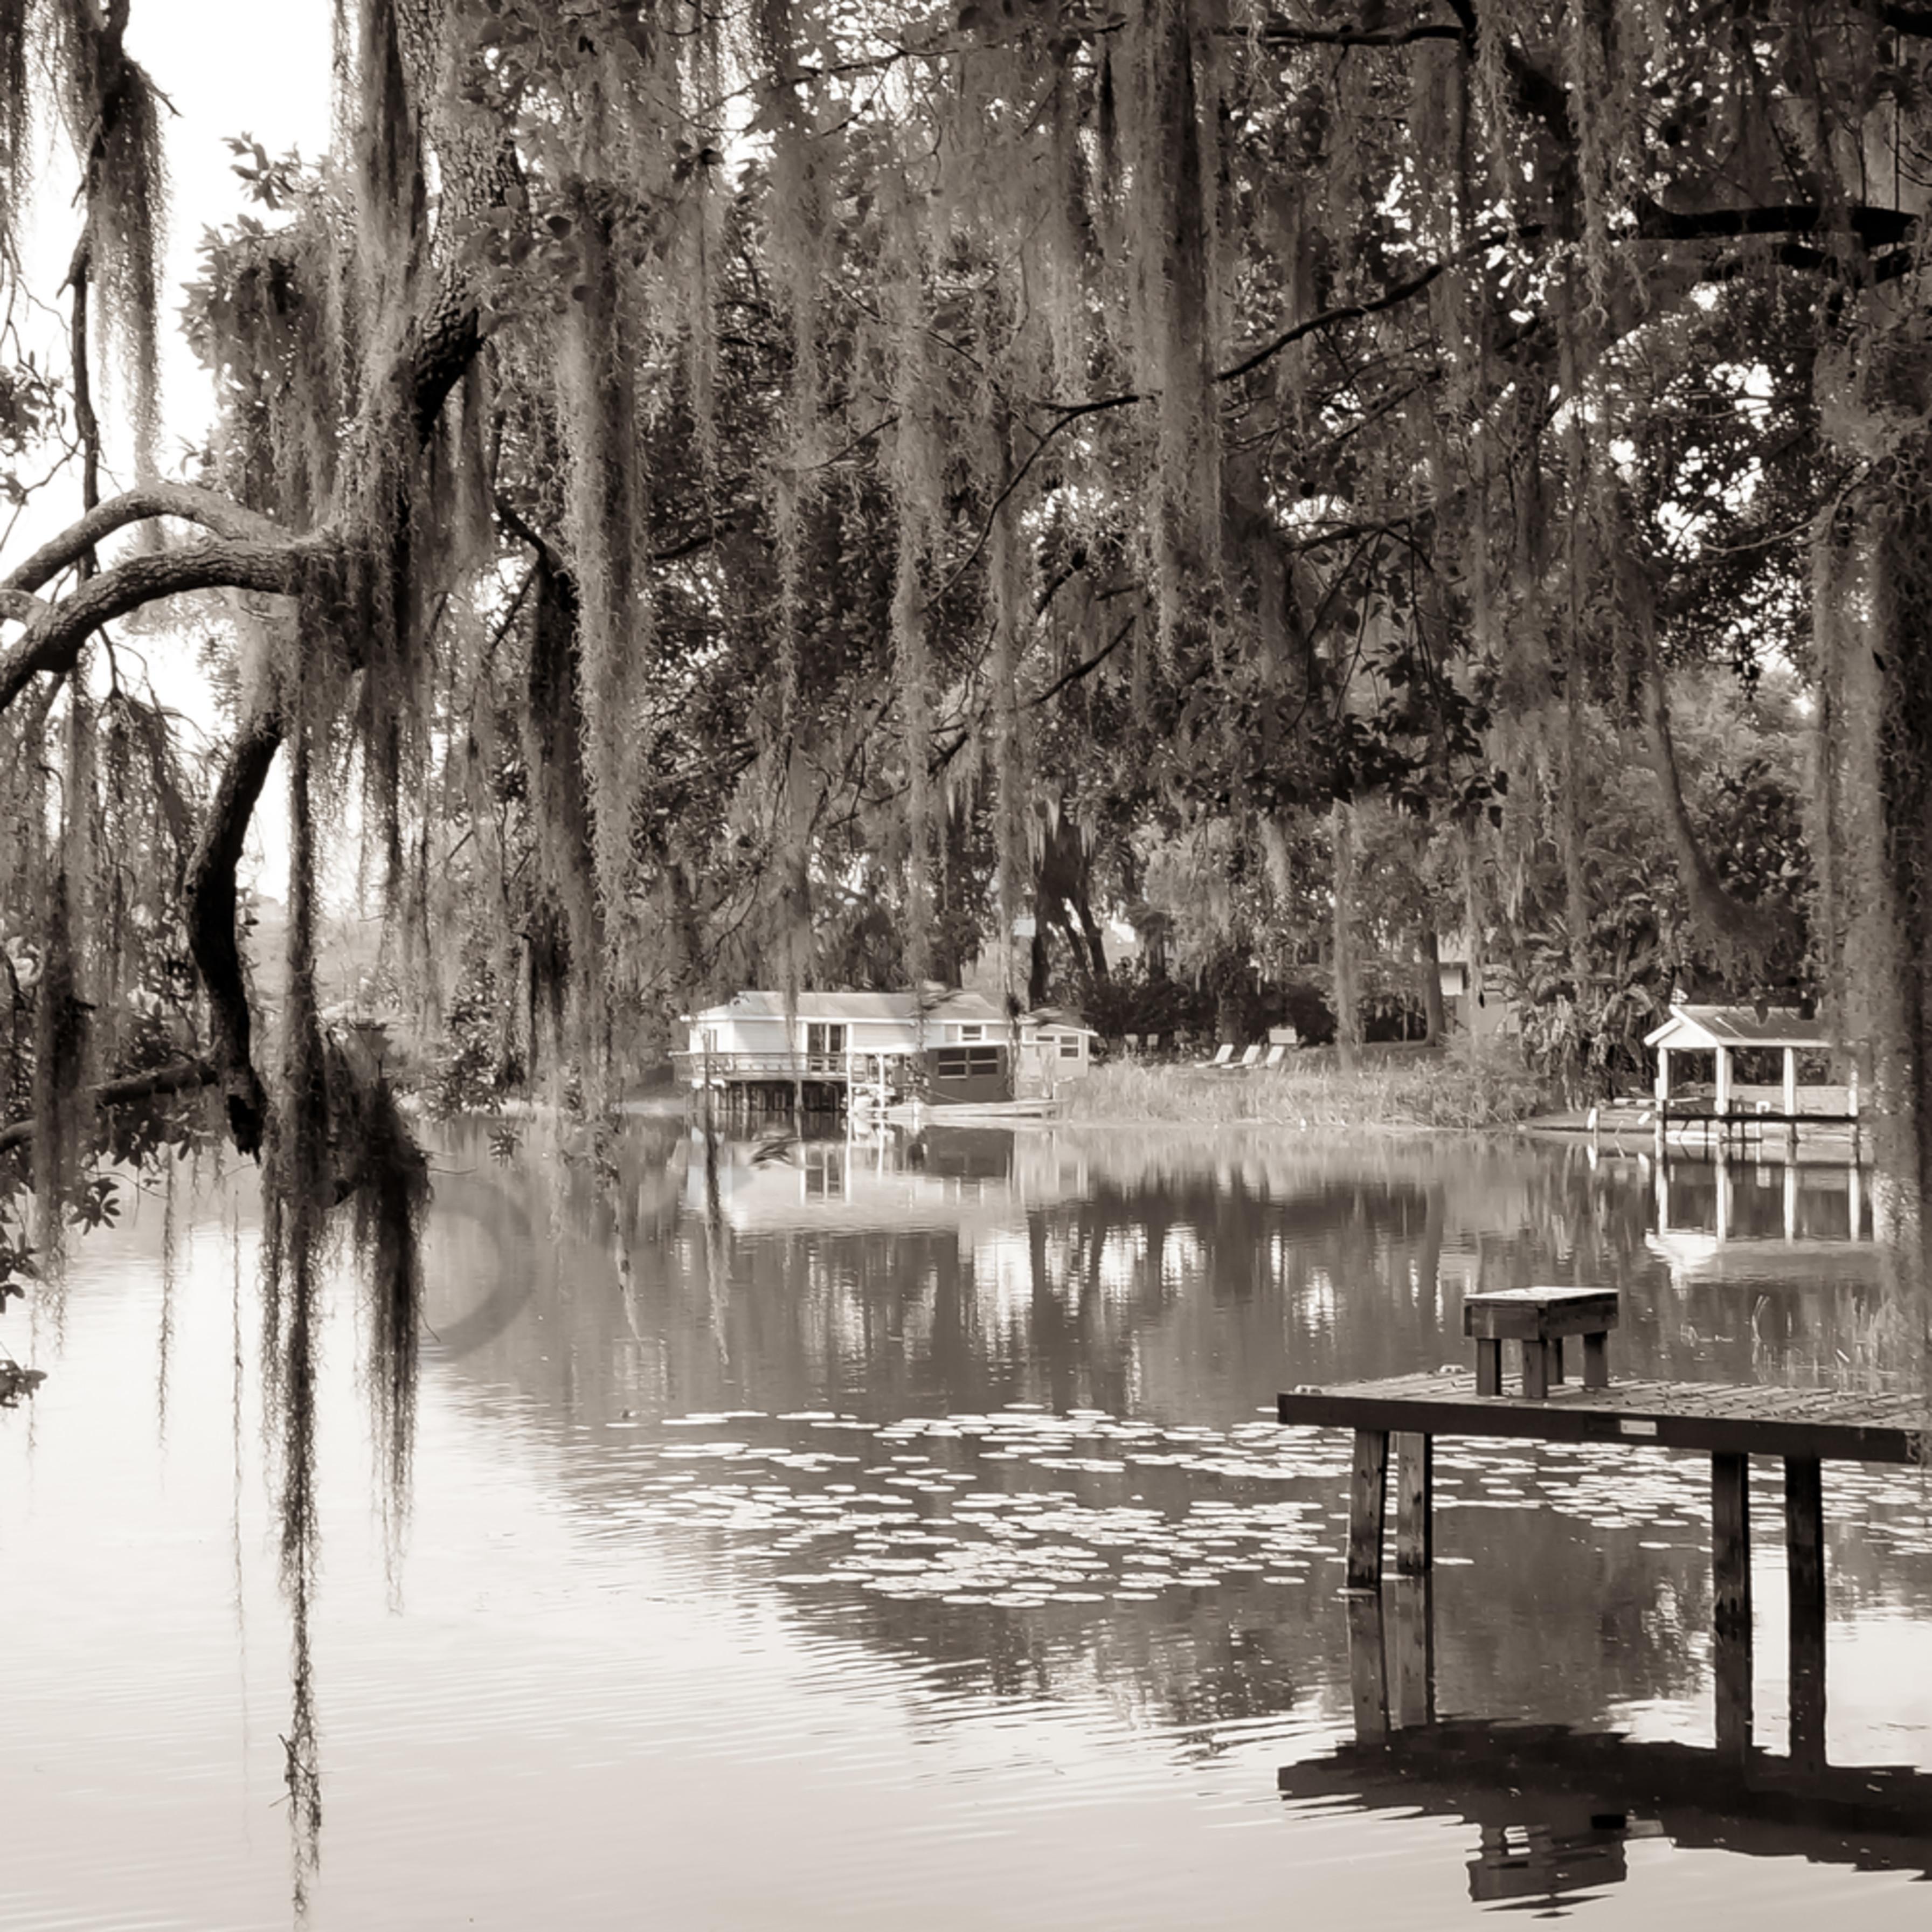 Bayou docks e02fxy